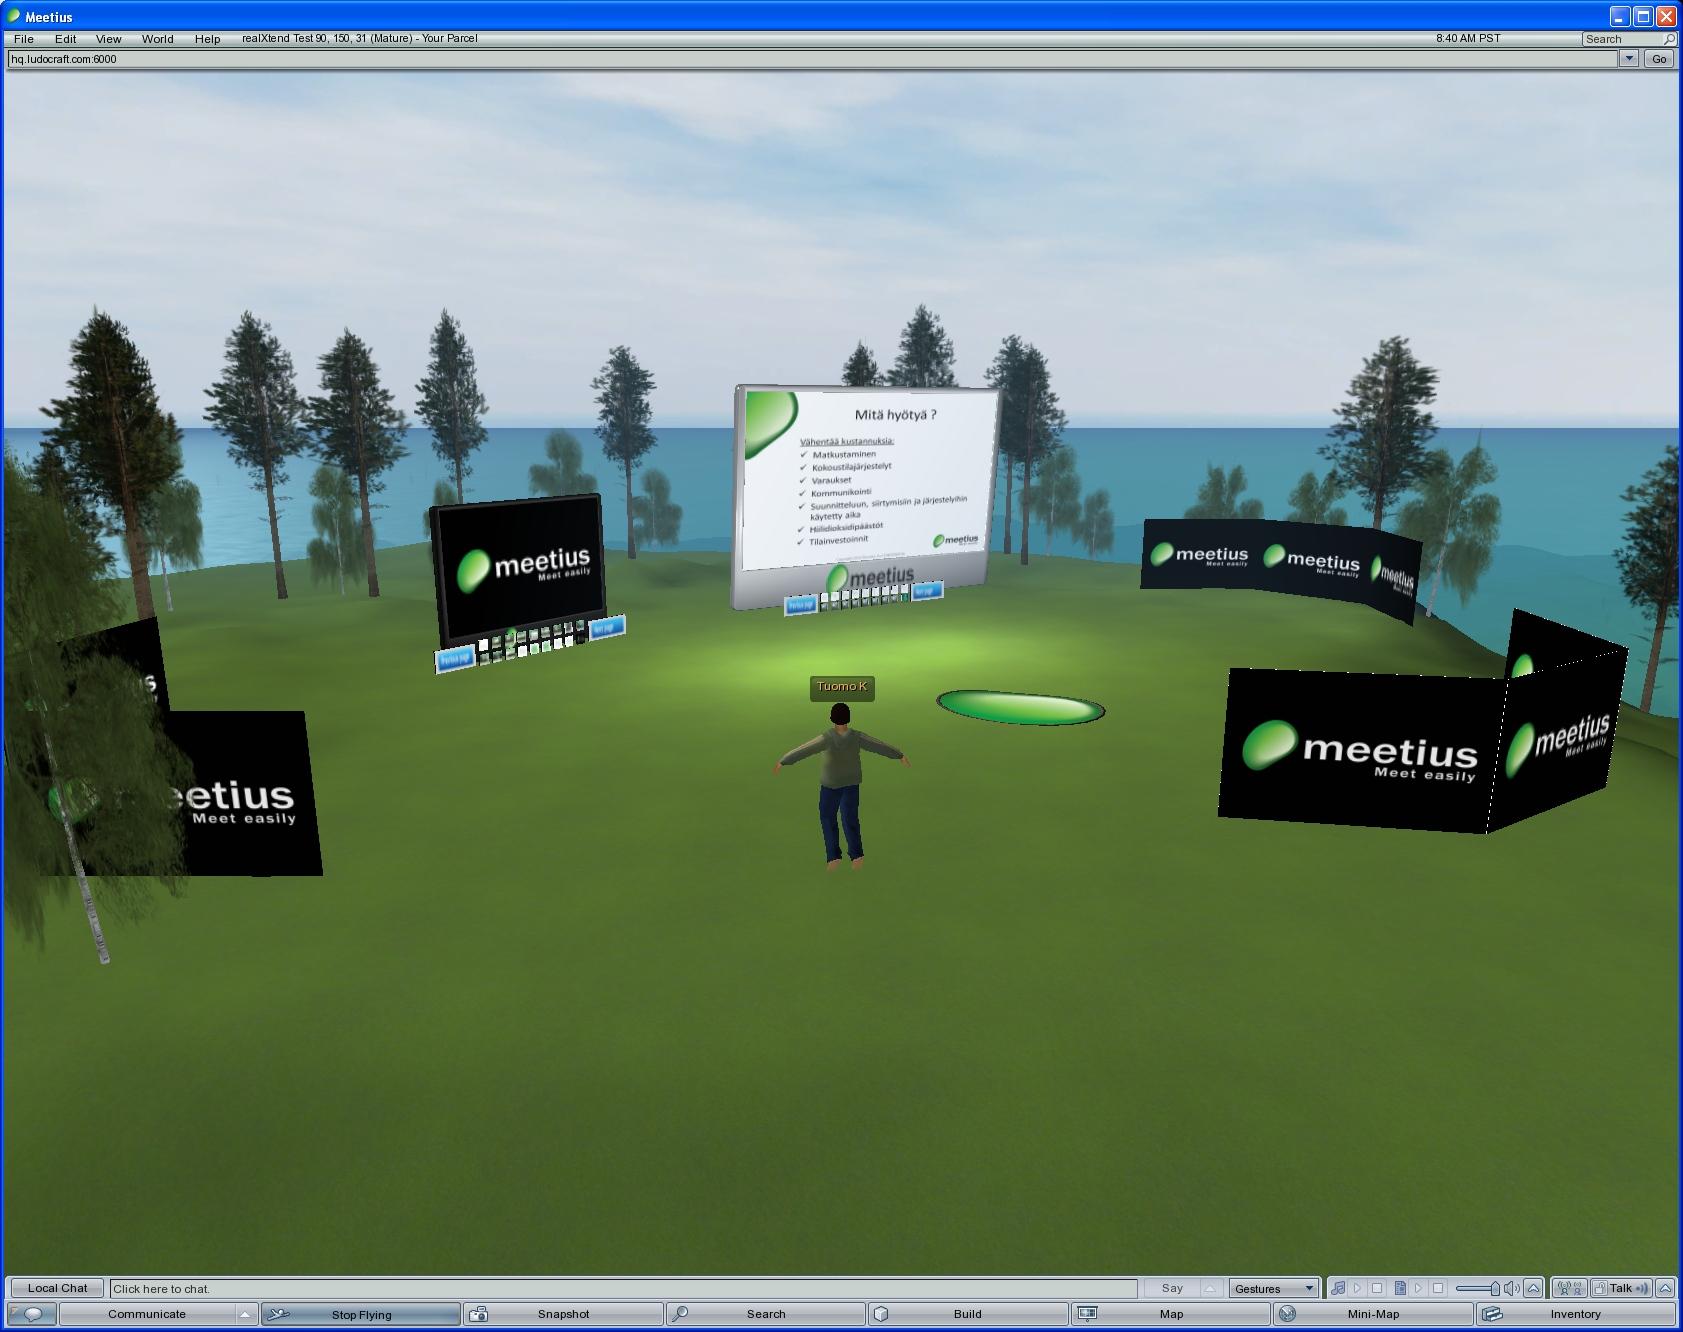 meetius_screenshot_09